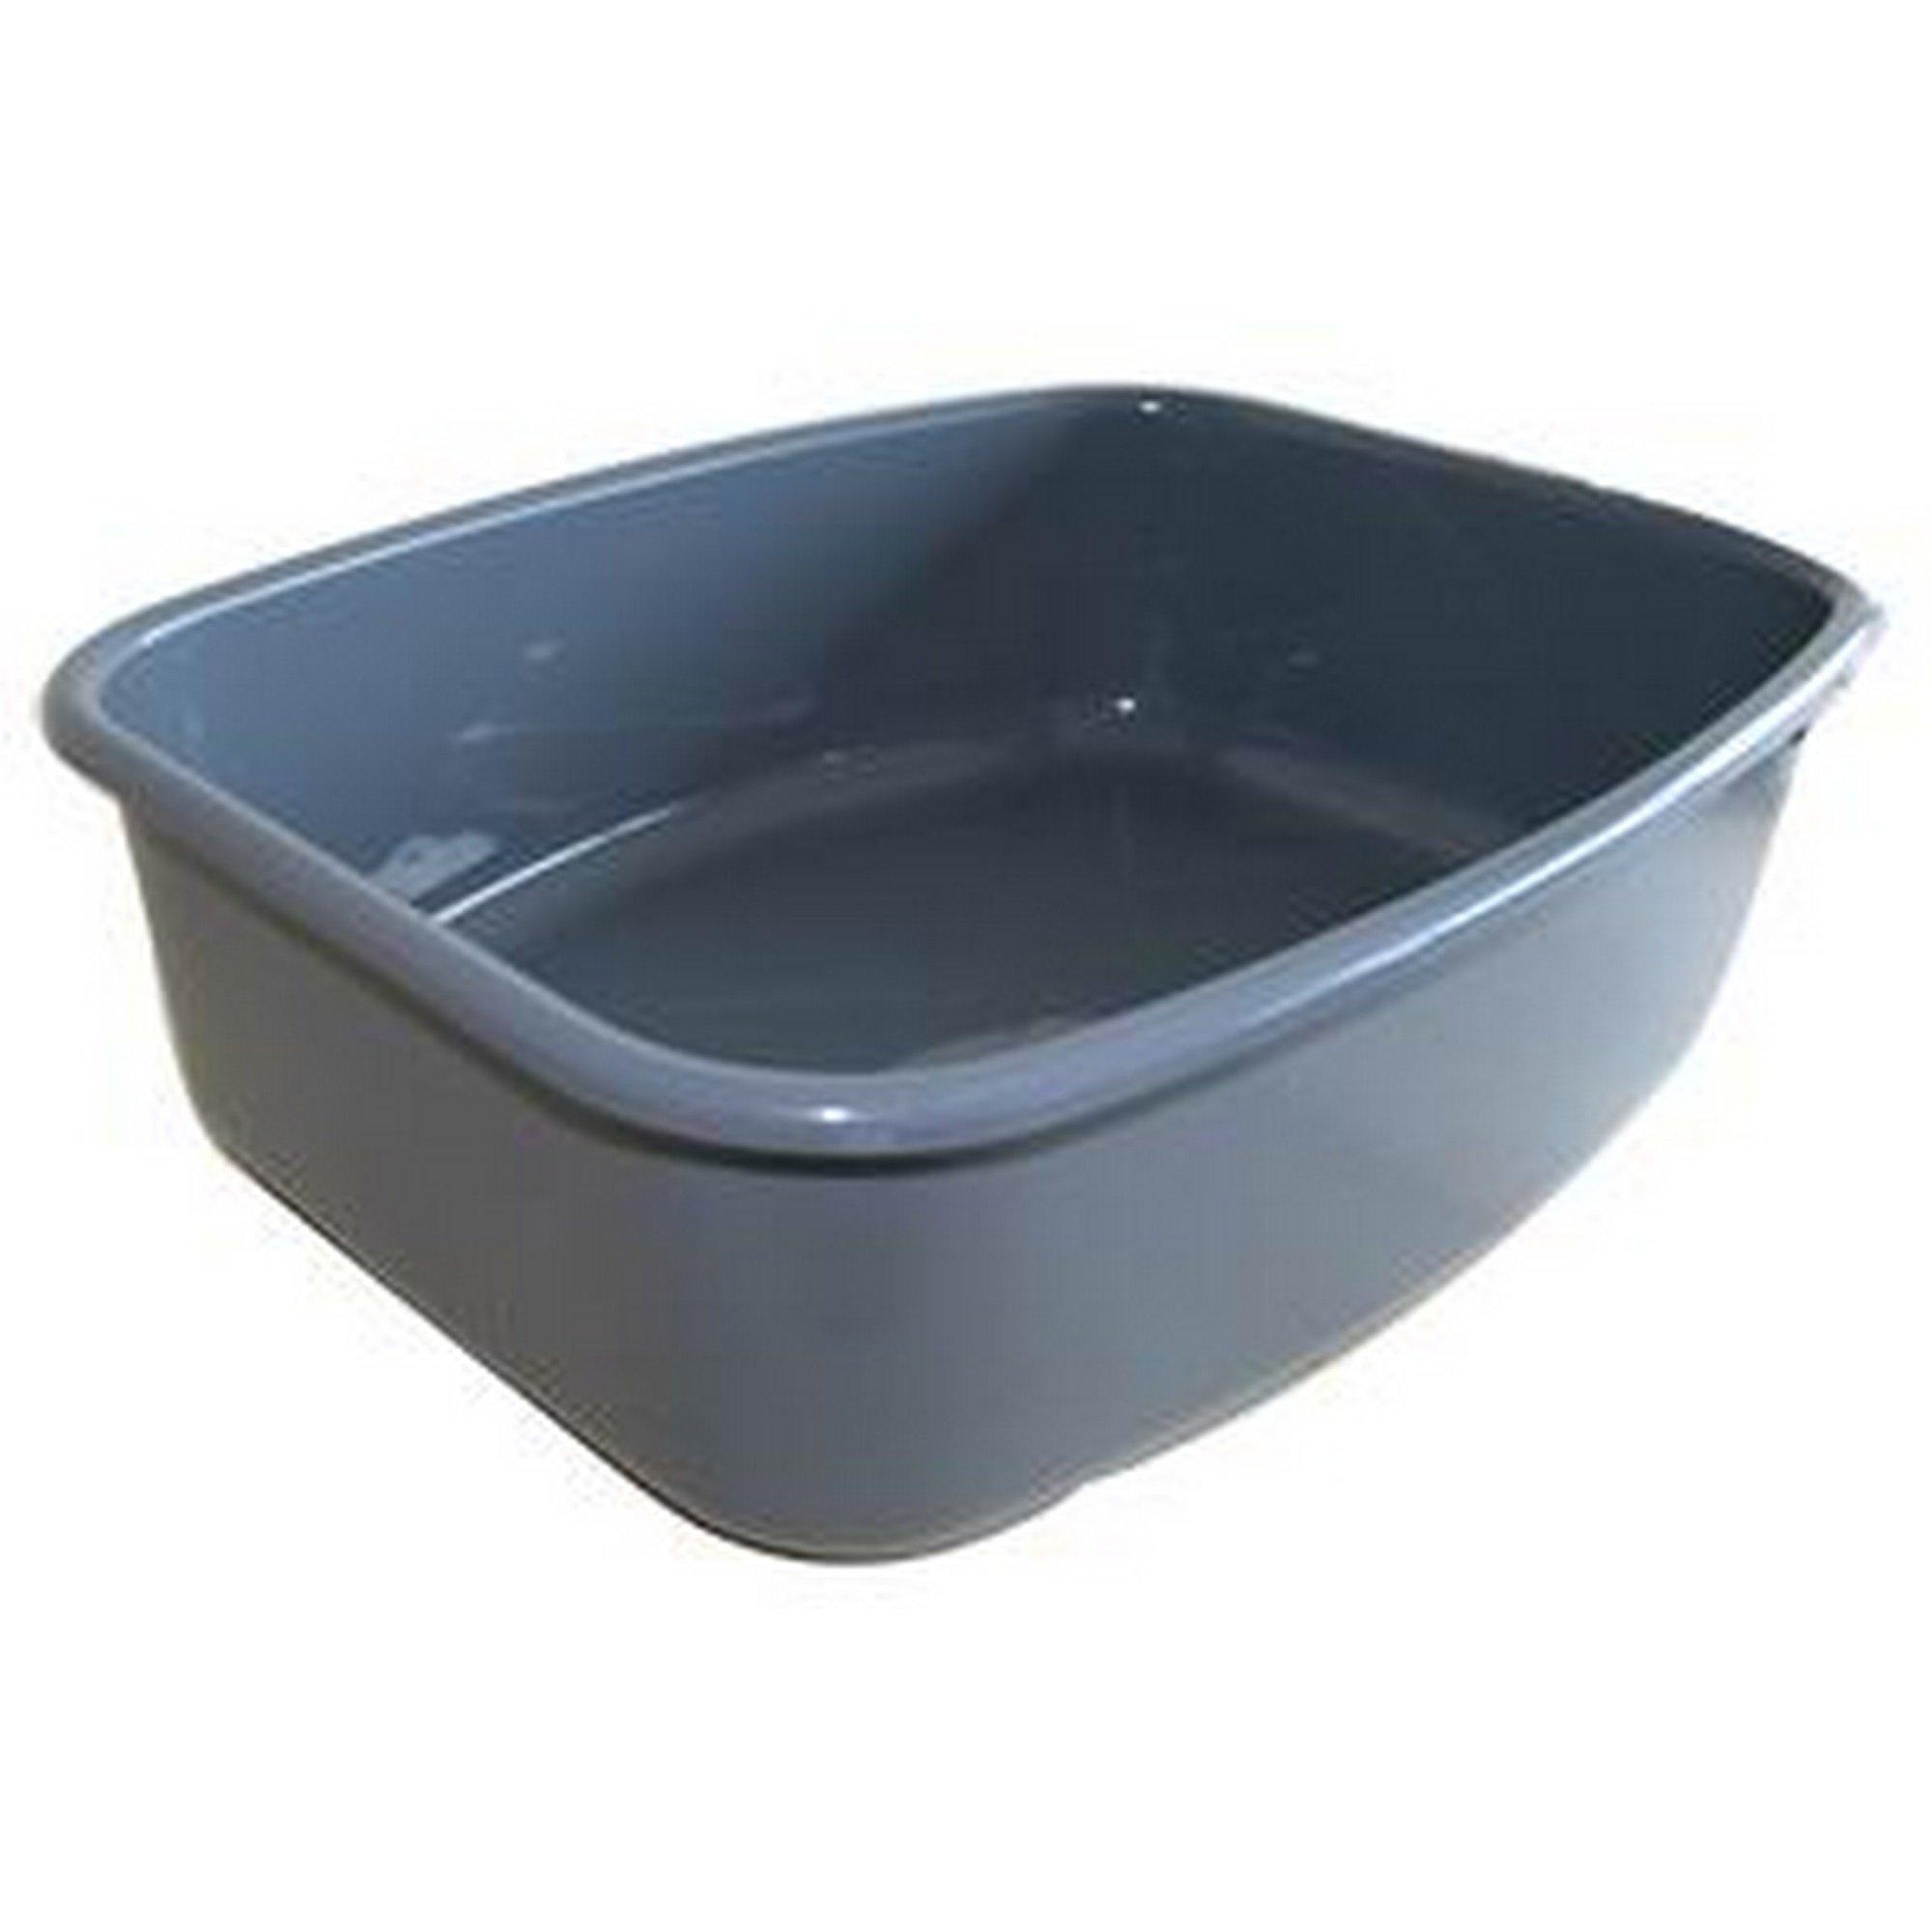 Spinflo Plastic Washing Up Bowl (One Size) (Grey)